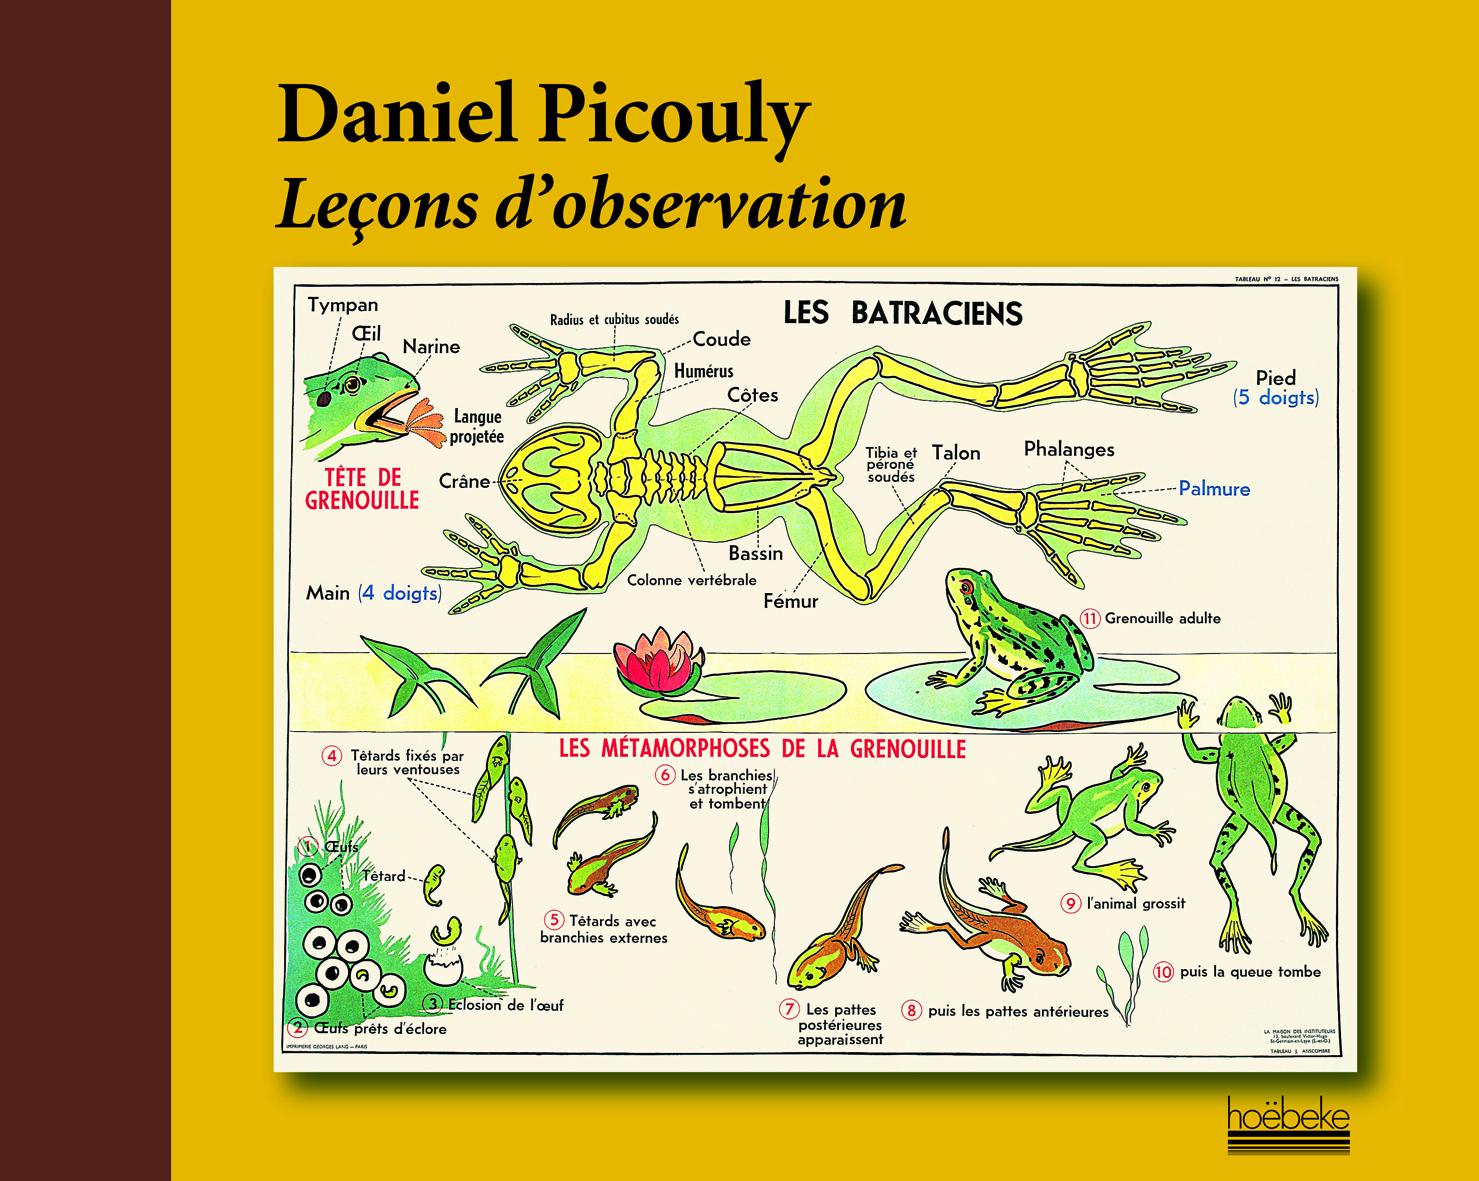 LECONS D'OBSERVATION